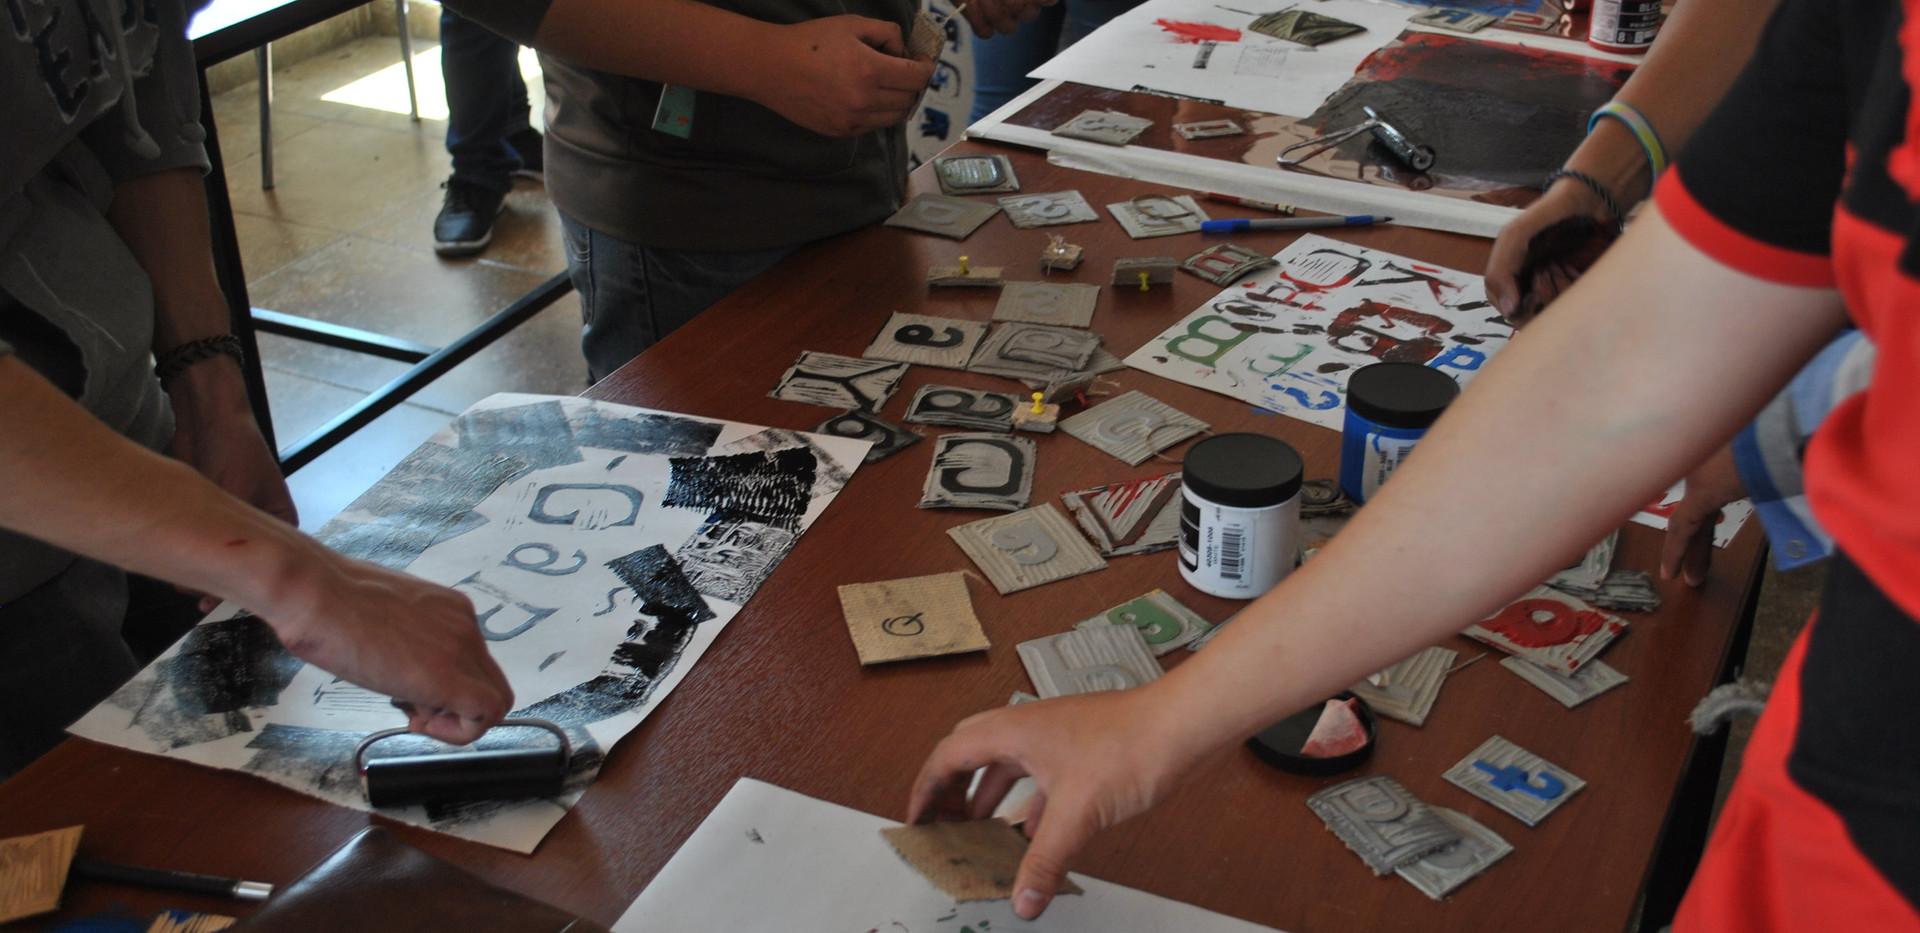 Unique Art Making Event